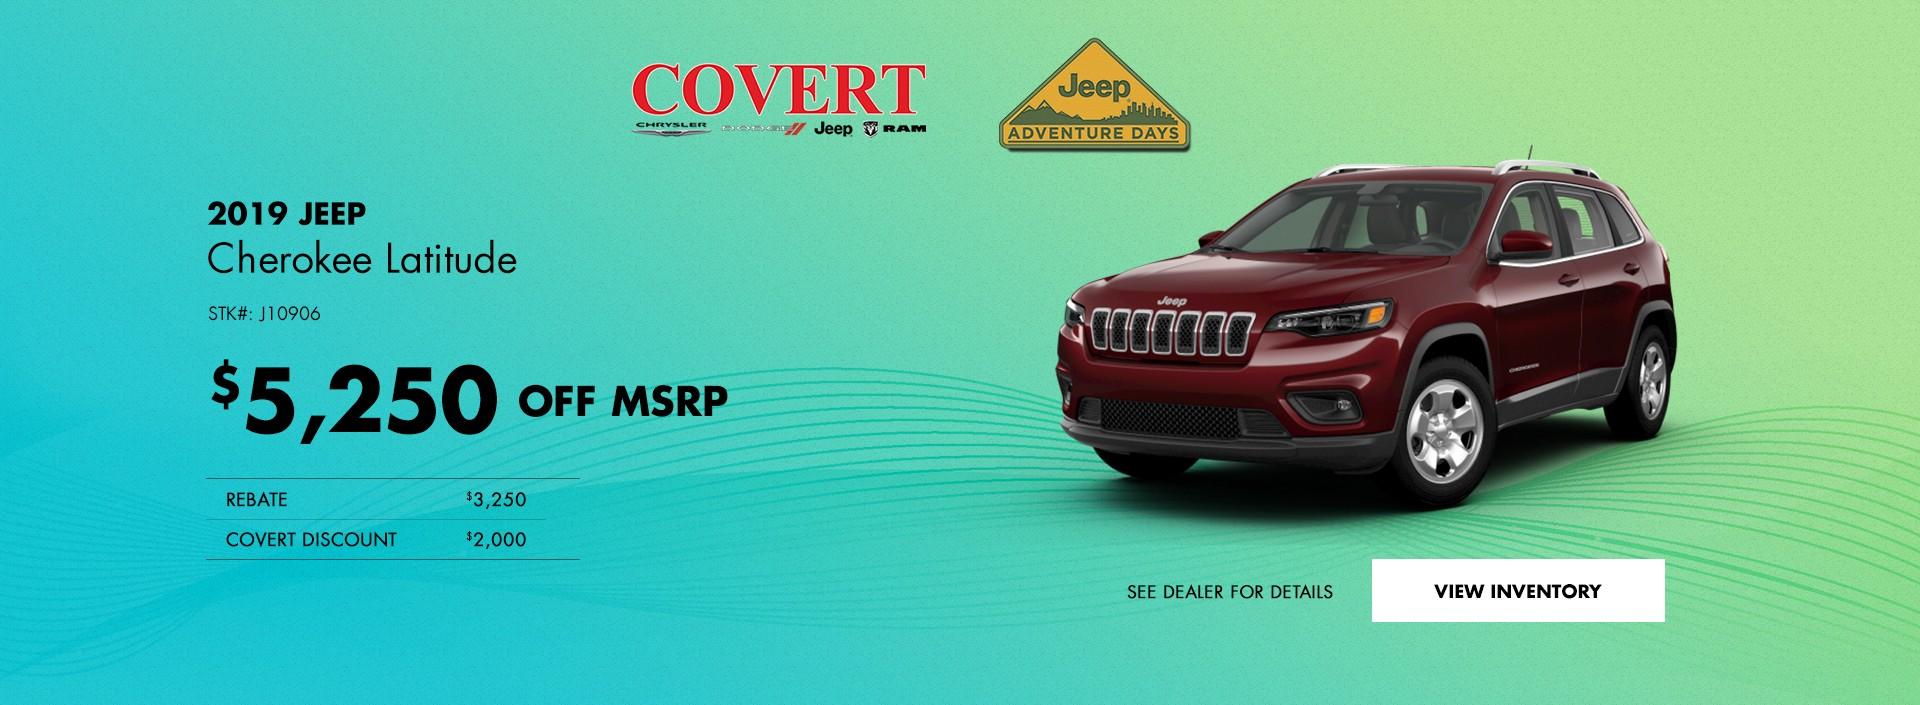 Covert Dodge Service >> New & Used Cars   Covert Chrysler Dodge Jeep   Austin, TX